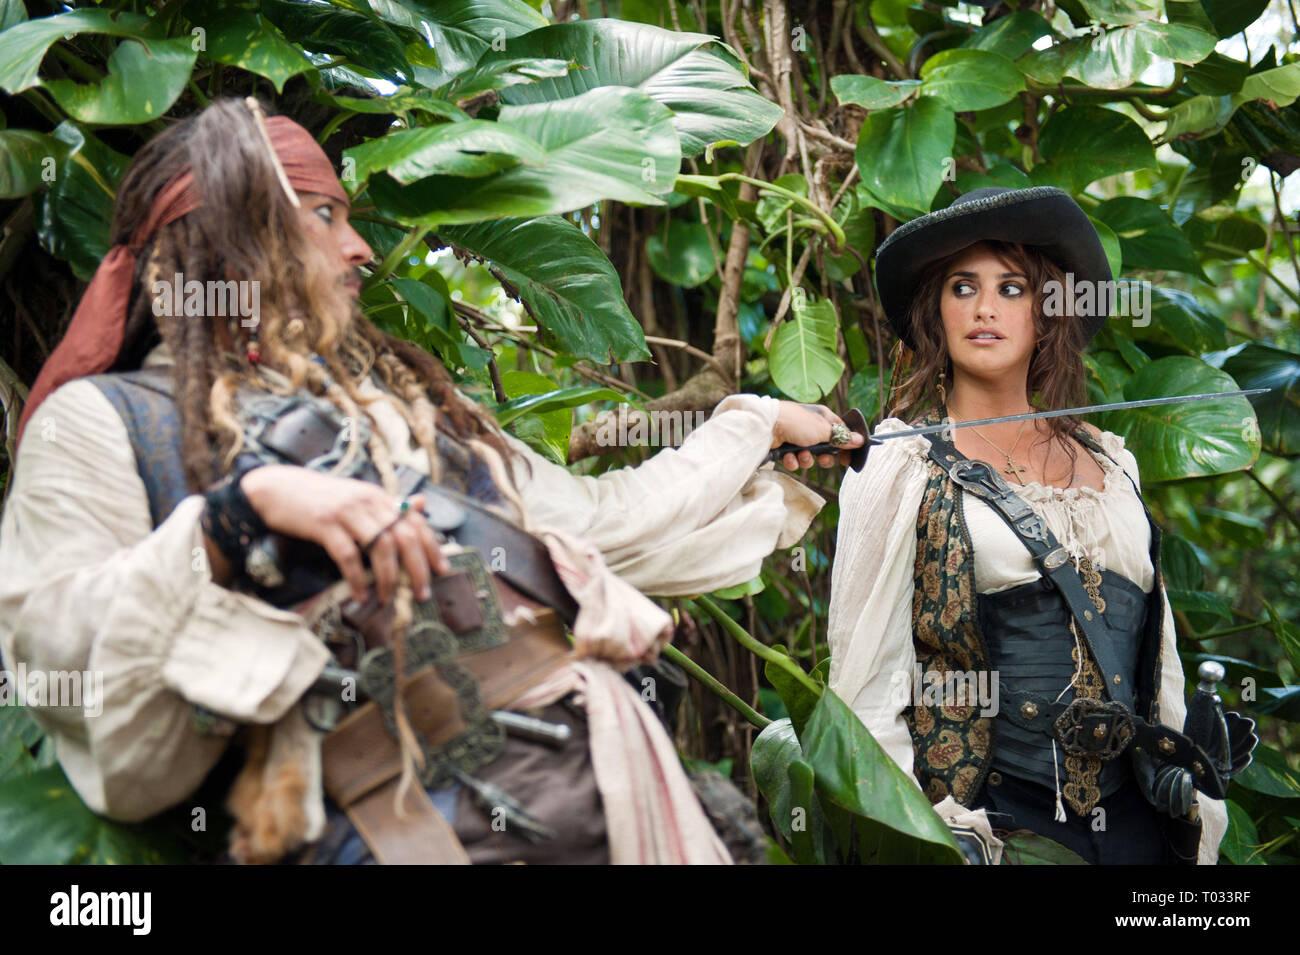 Johnny Depp Penelope Cruz Pirates Of The Caribbean On Stranger Tides 2011 Stock Photo Alamy